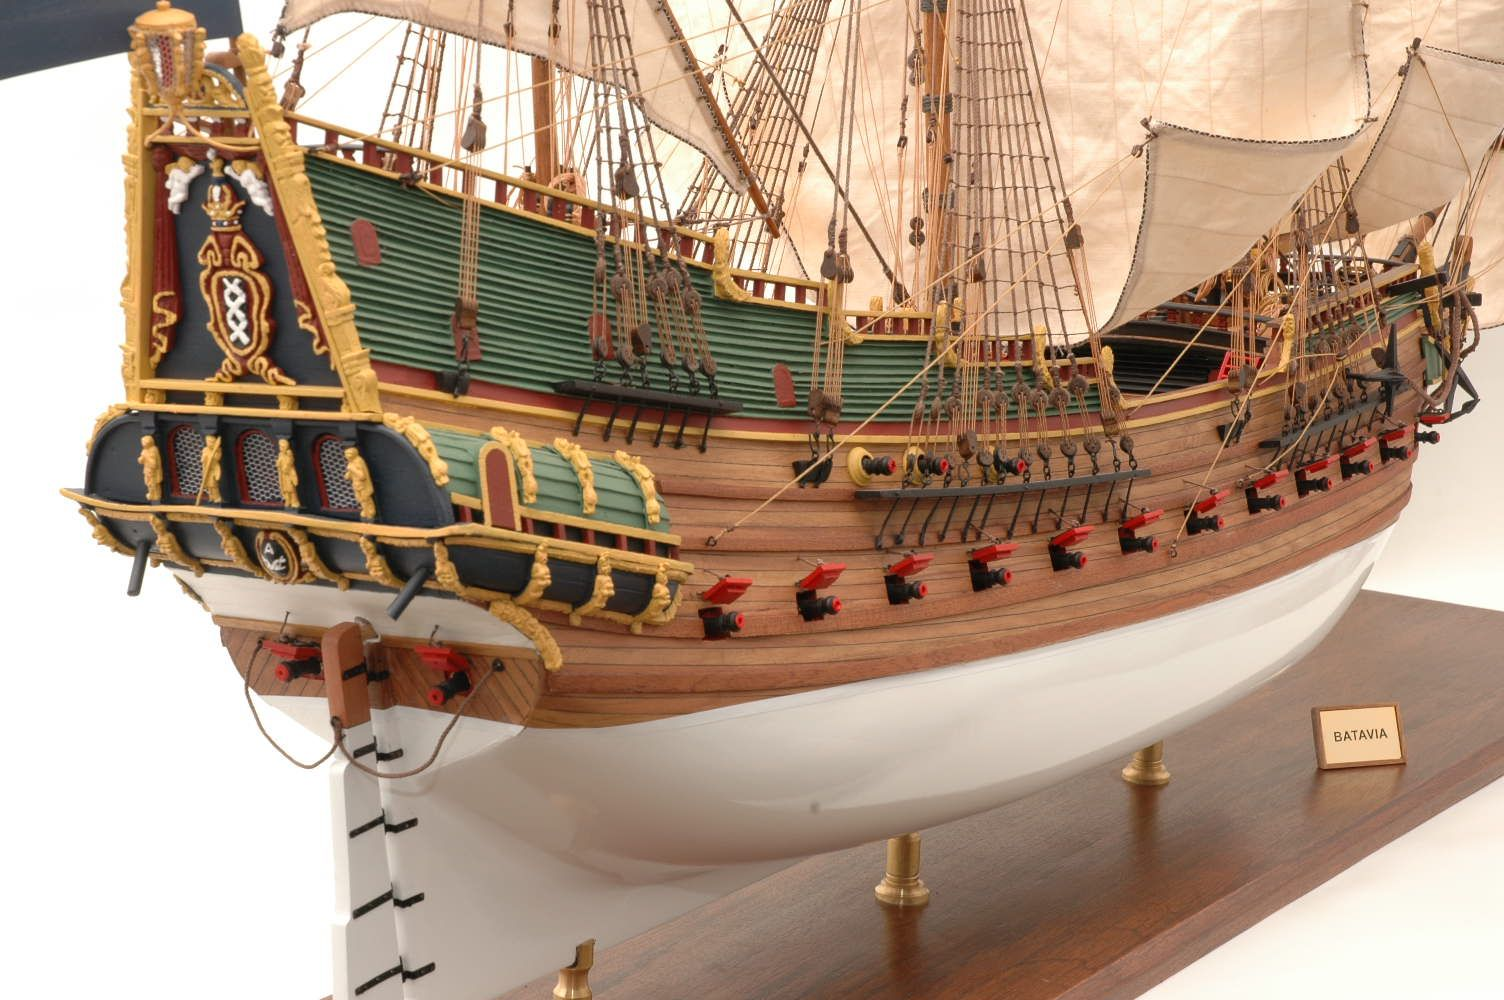 228-6955-Batavia-model-ship-Premier-Range